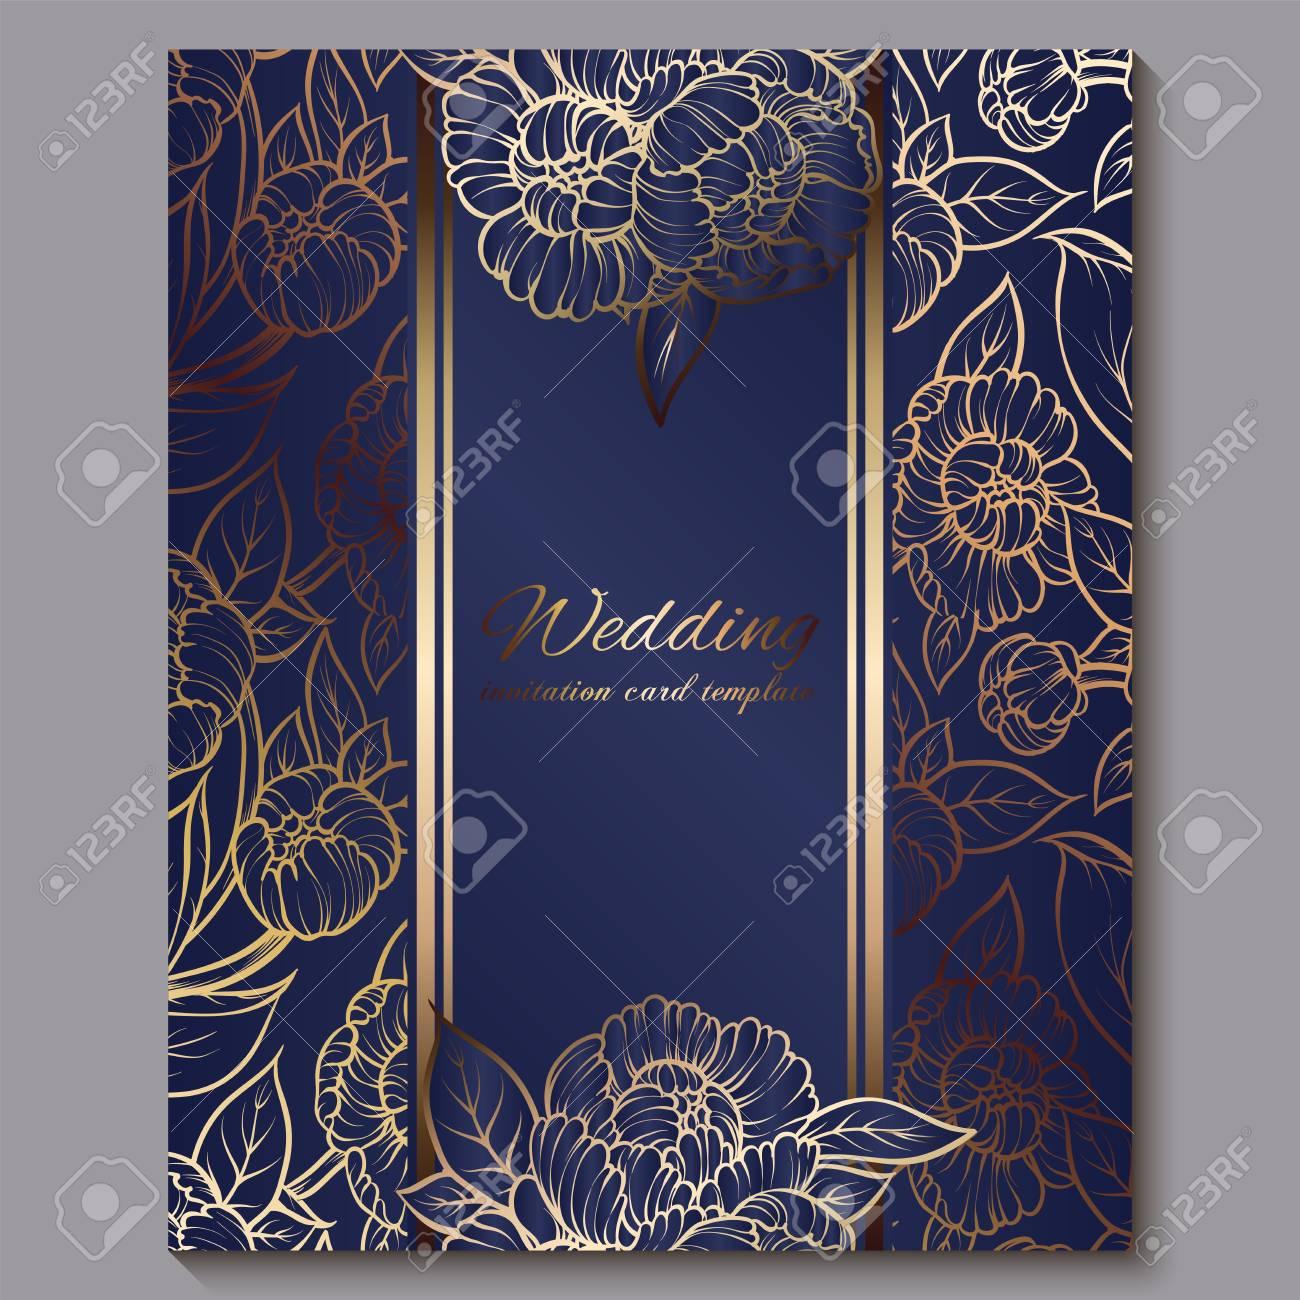 exquisite royal luxury wedding invitation gold on blue background